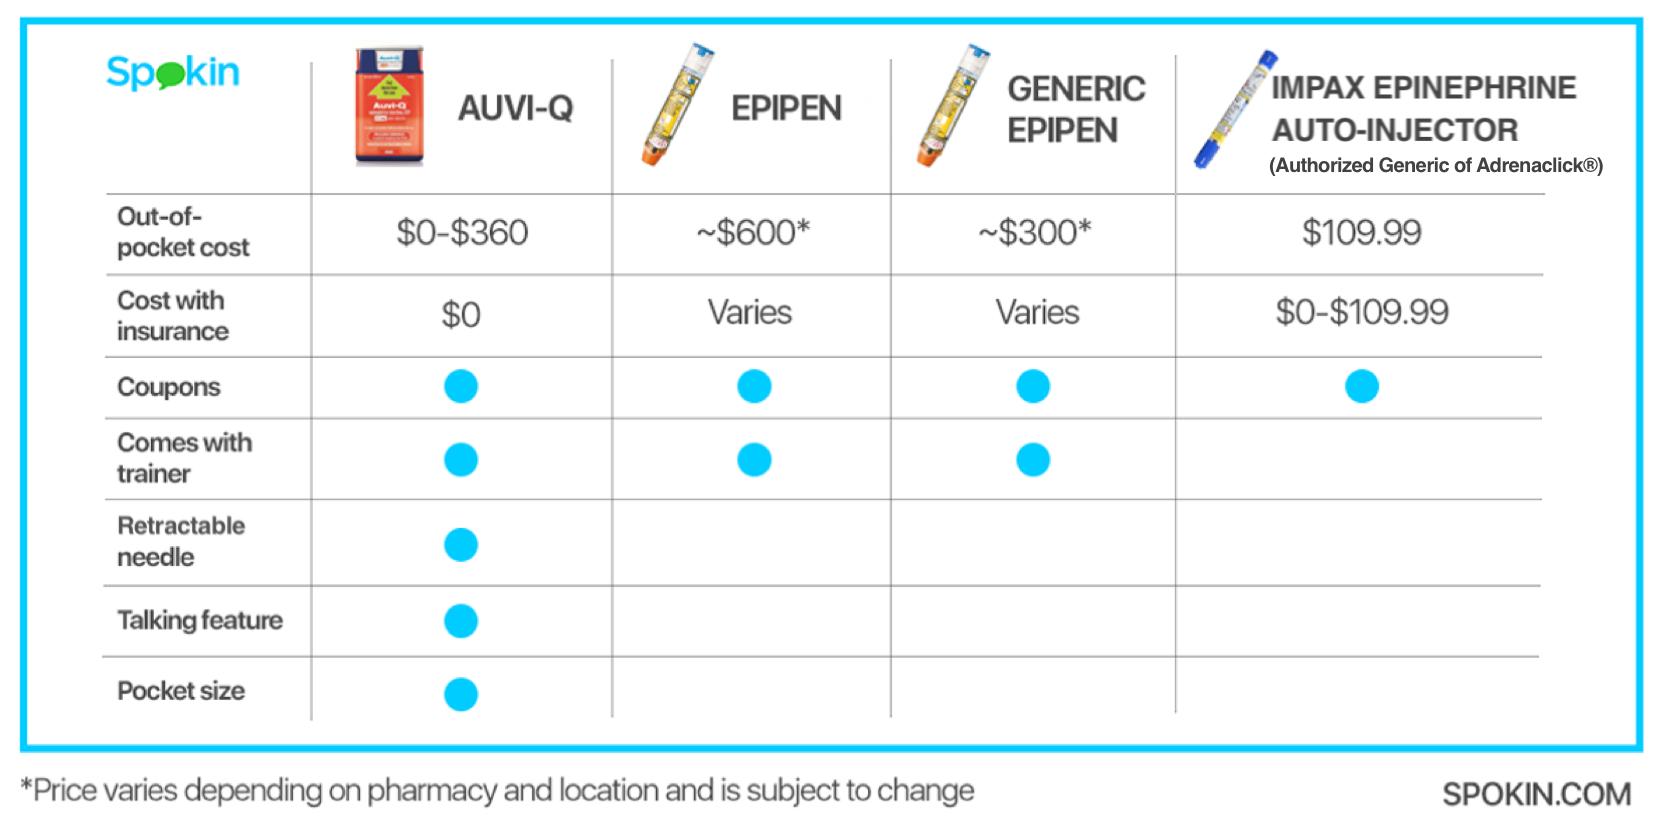 Auto-Injectors Comparison Chart at a Glance